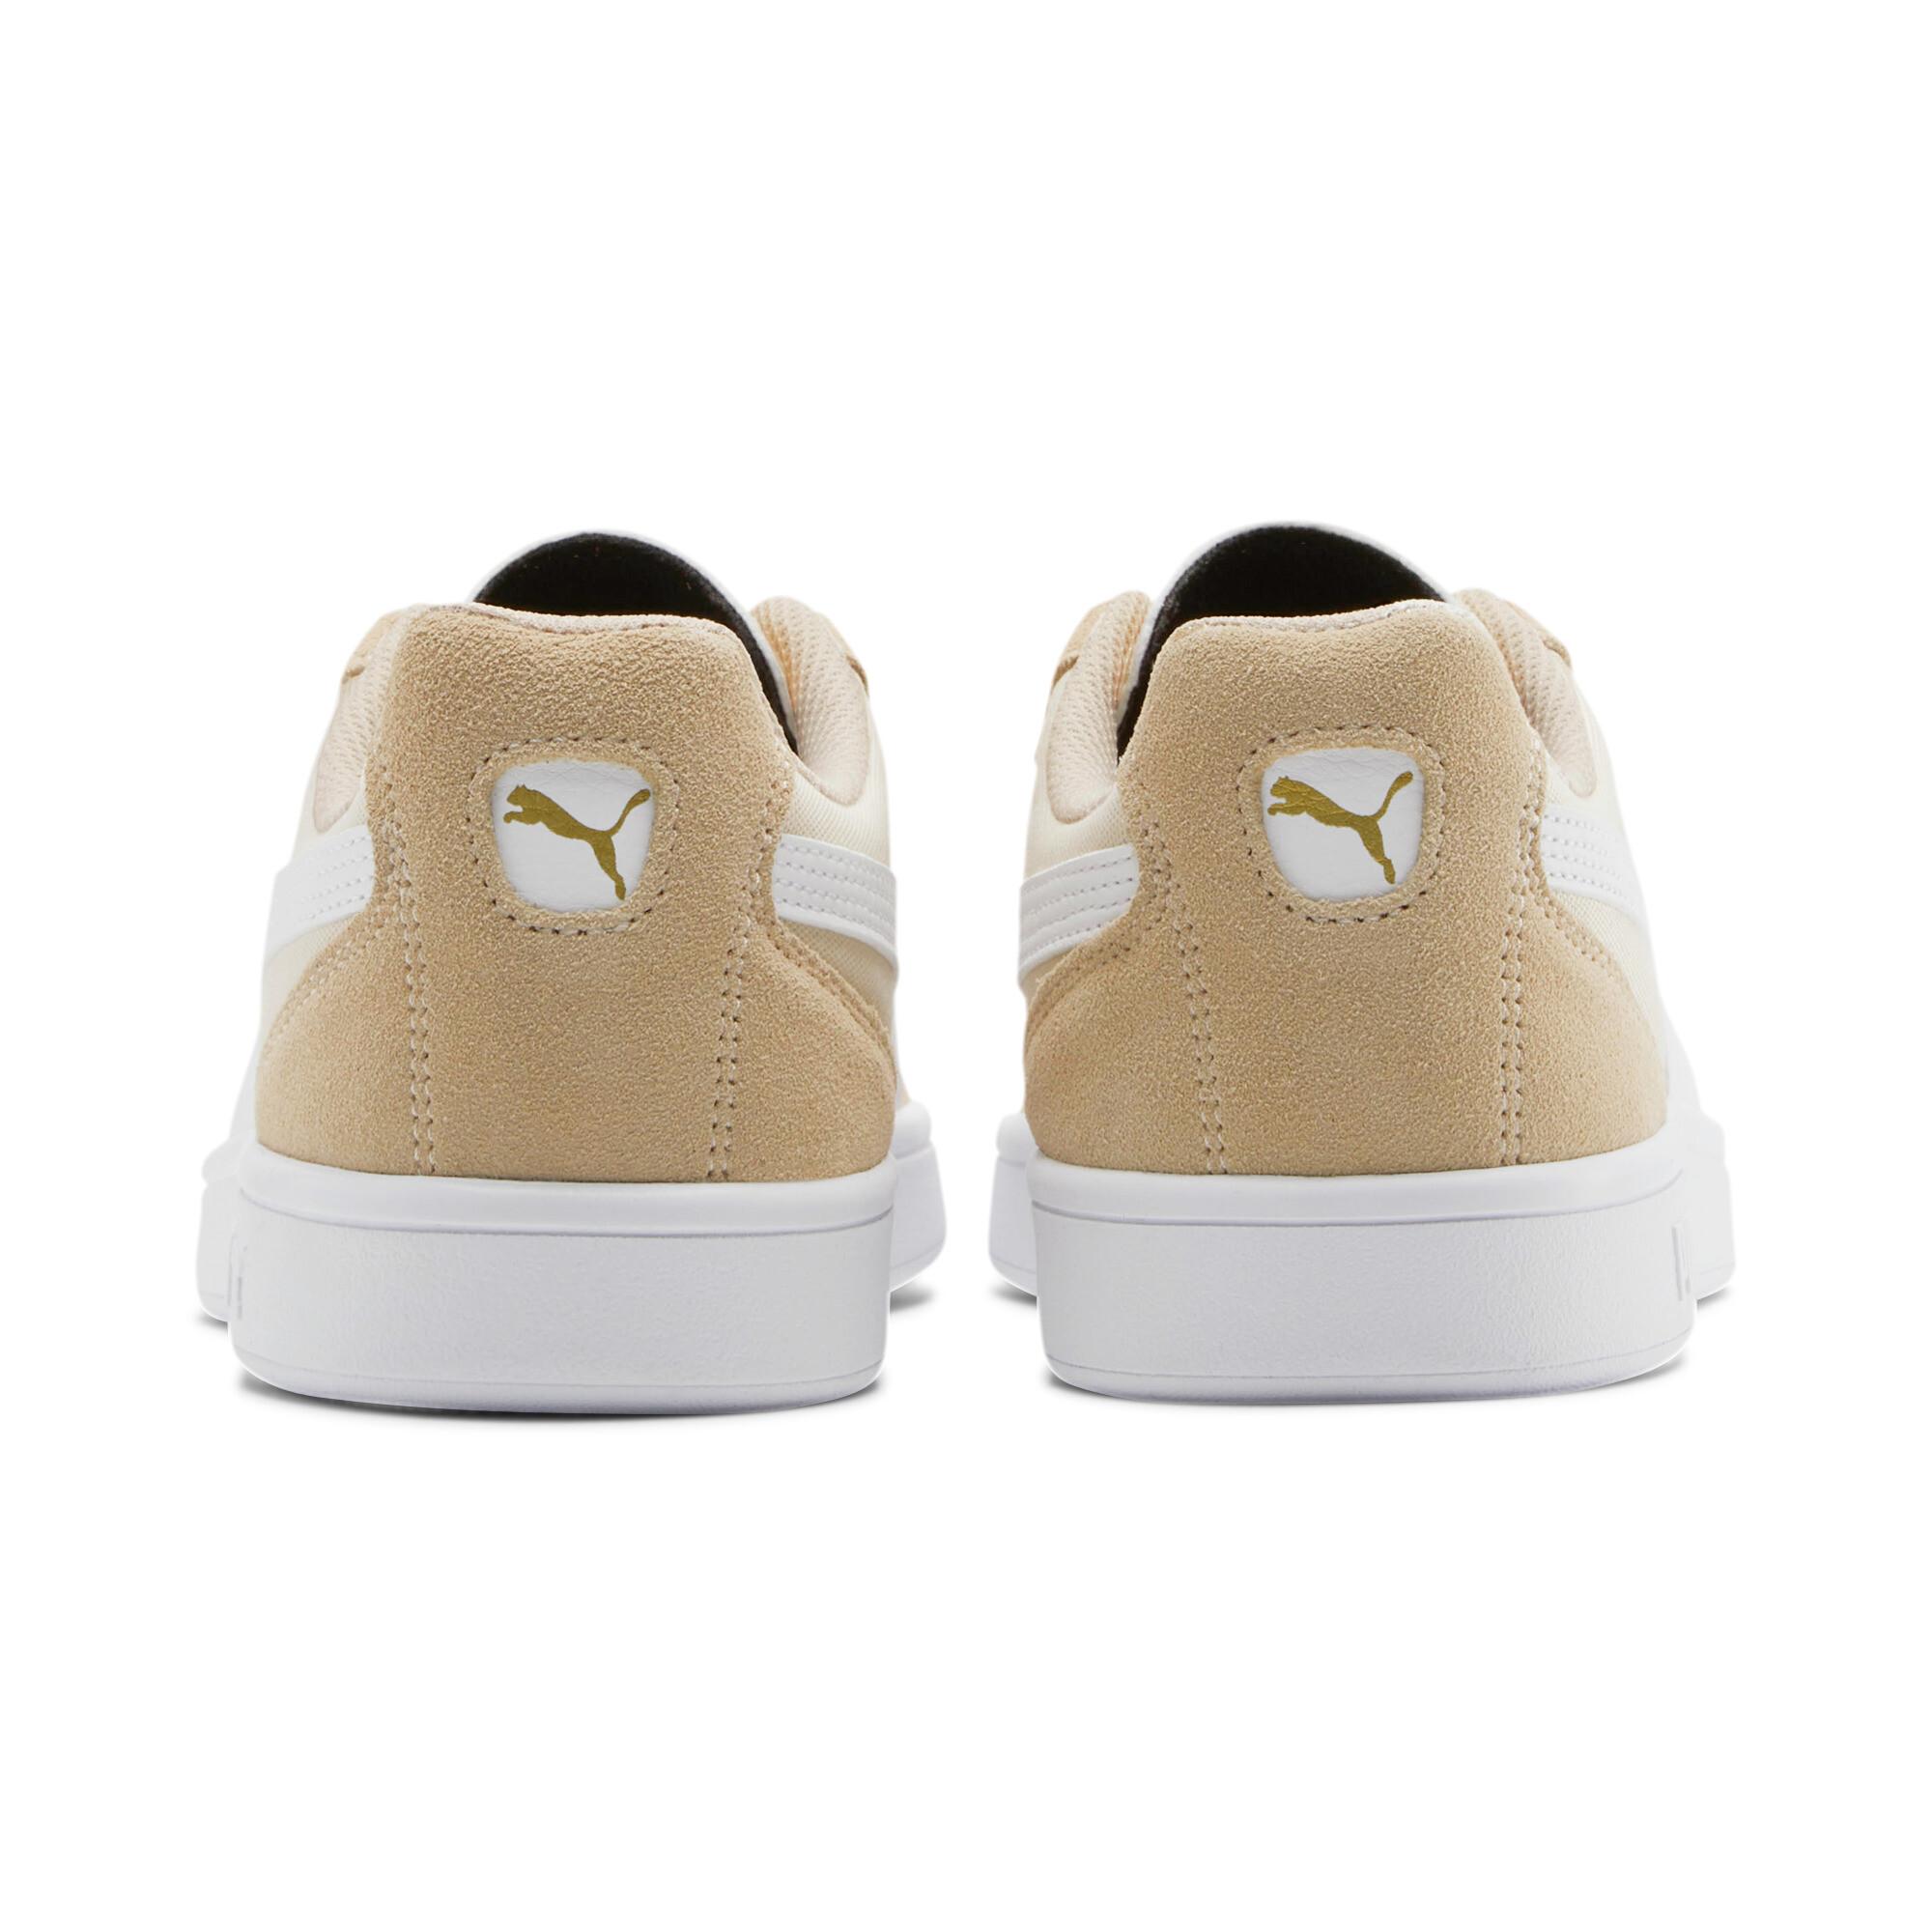 PUMA-Men-039-s-Astro-Kick-Sneakers thumbnail 30